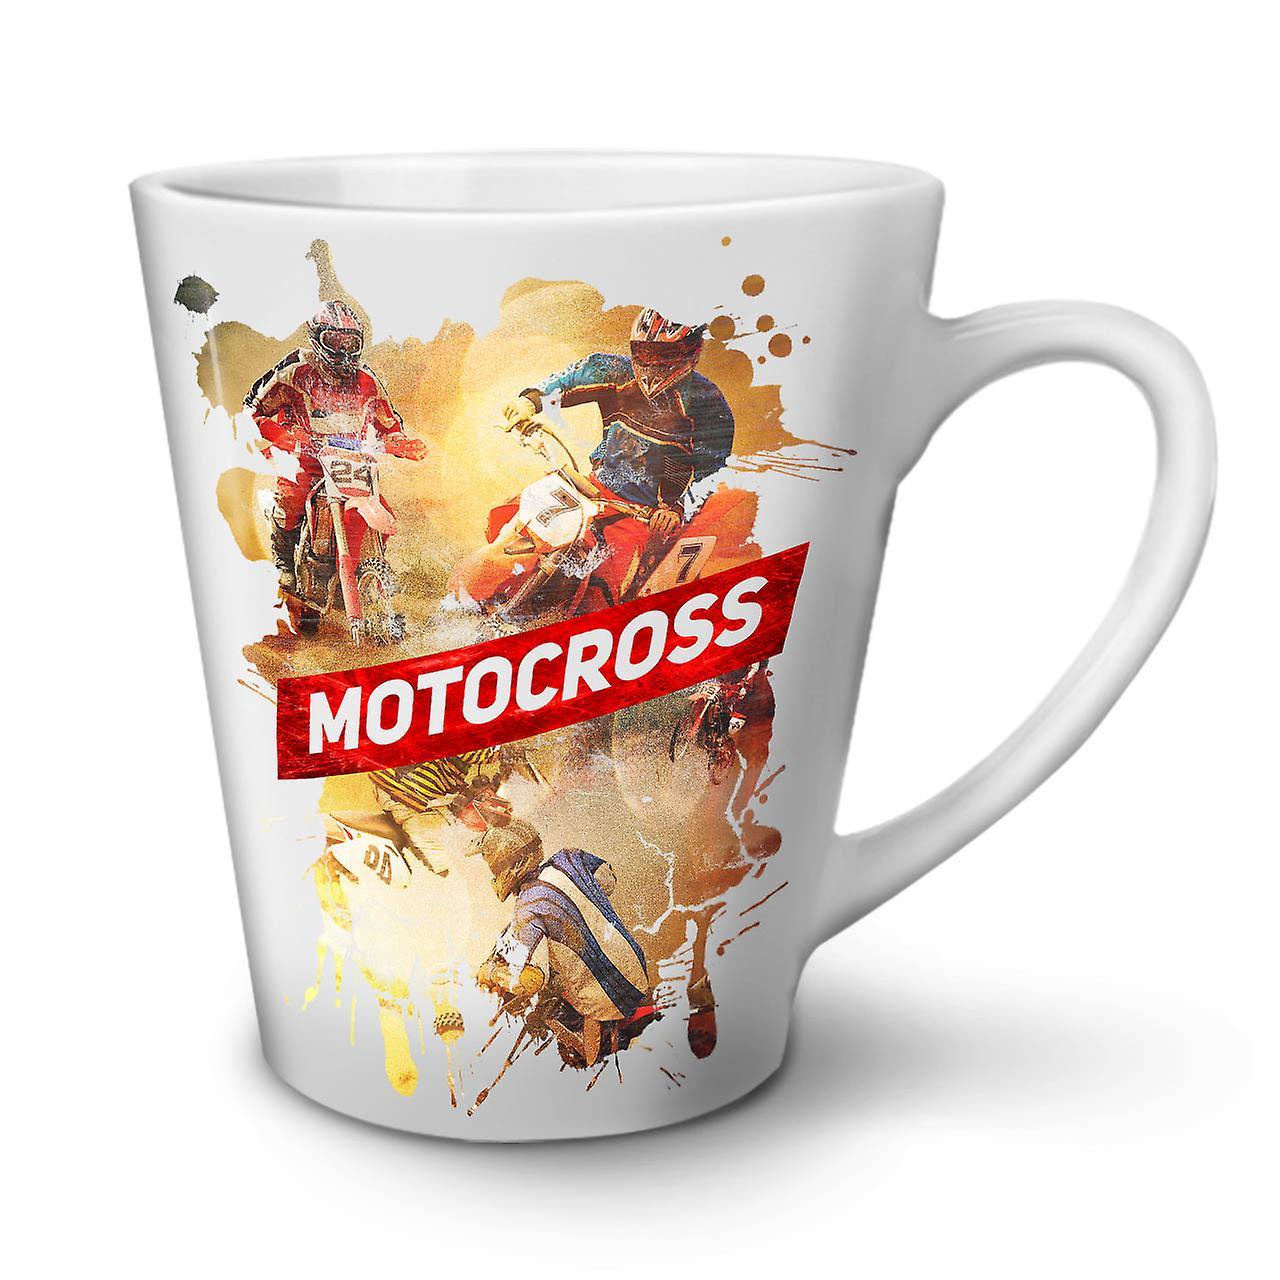 De Latte Nouvelle Tasse Céramique 12 Dérive Café Blanche Motocross OzWellcoda En y8wmnvON0